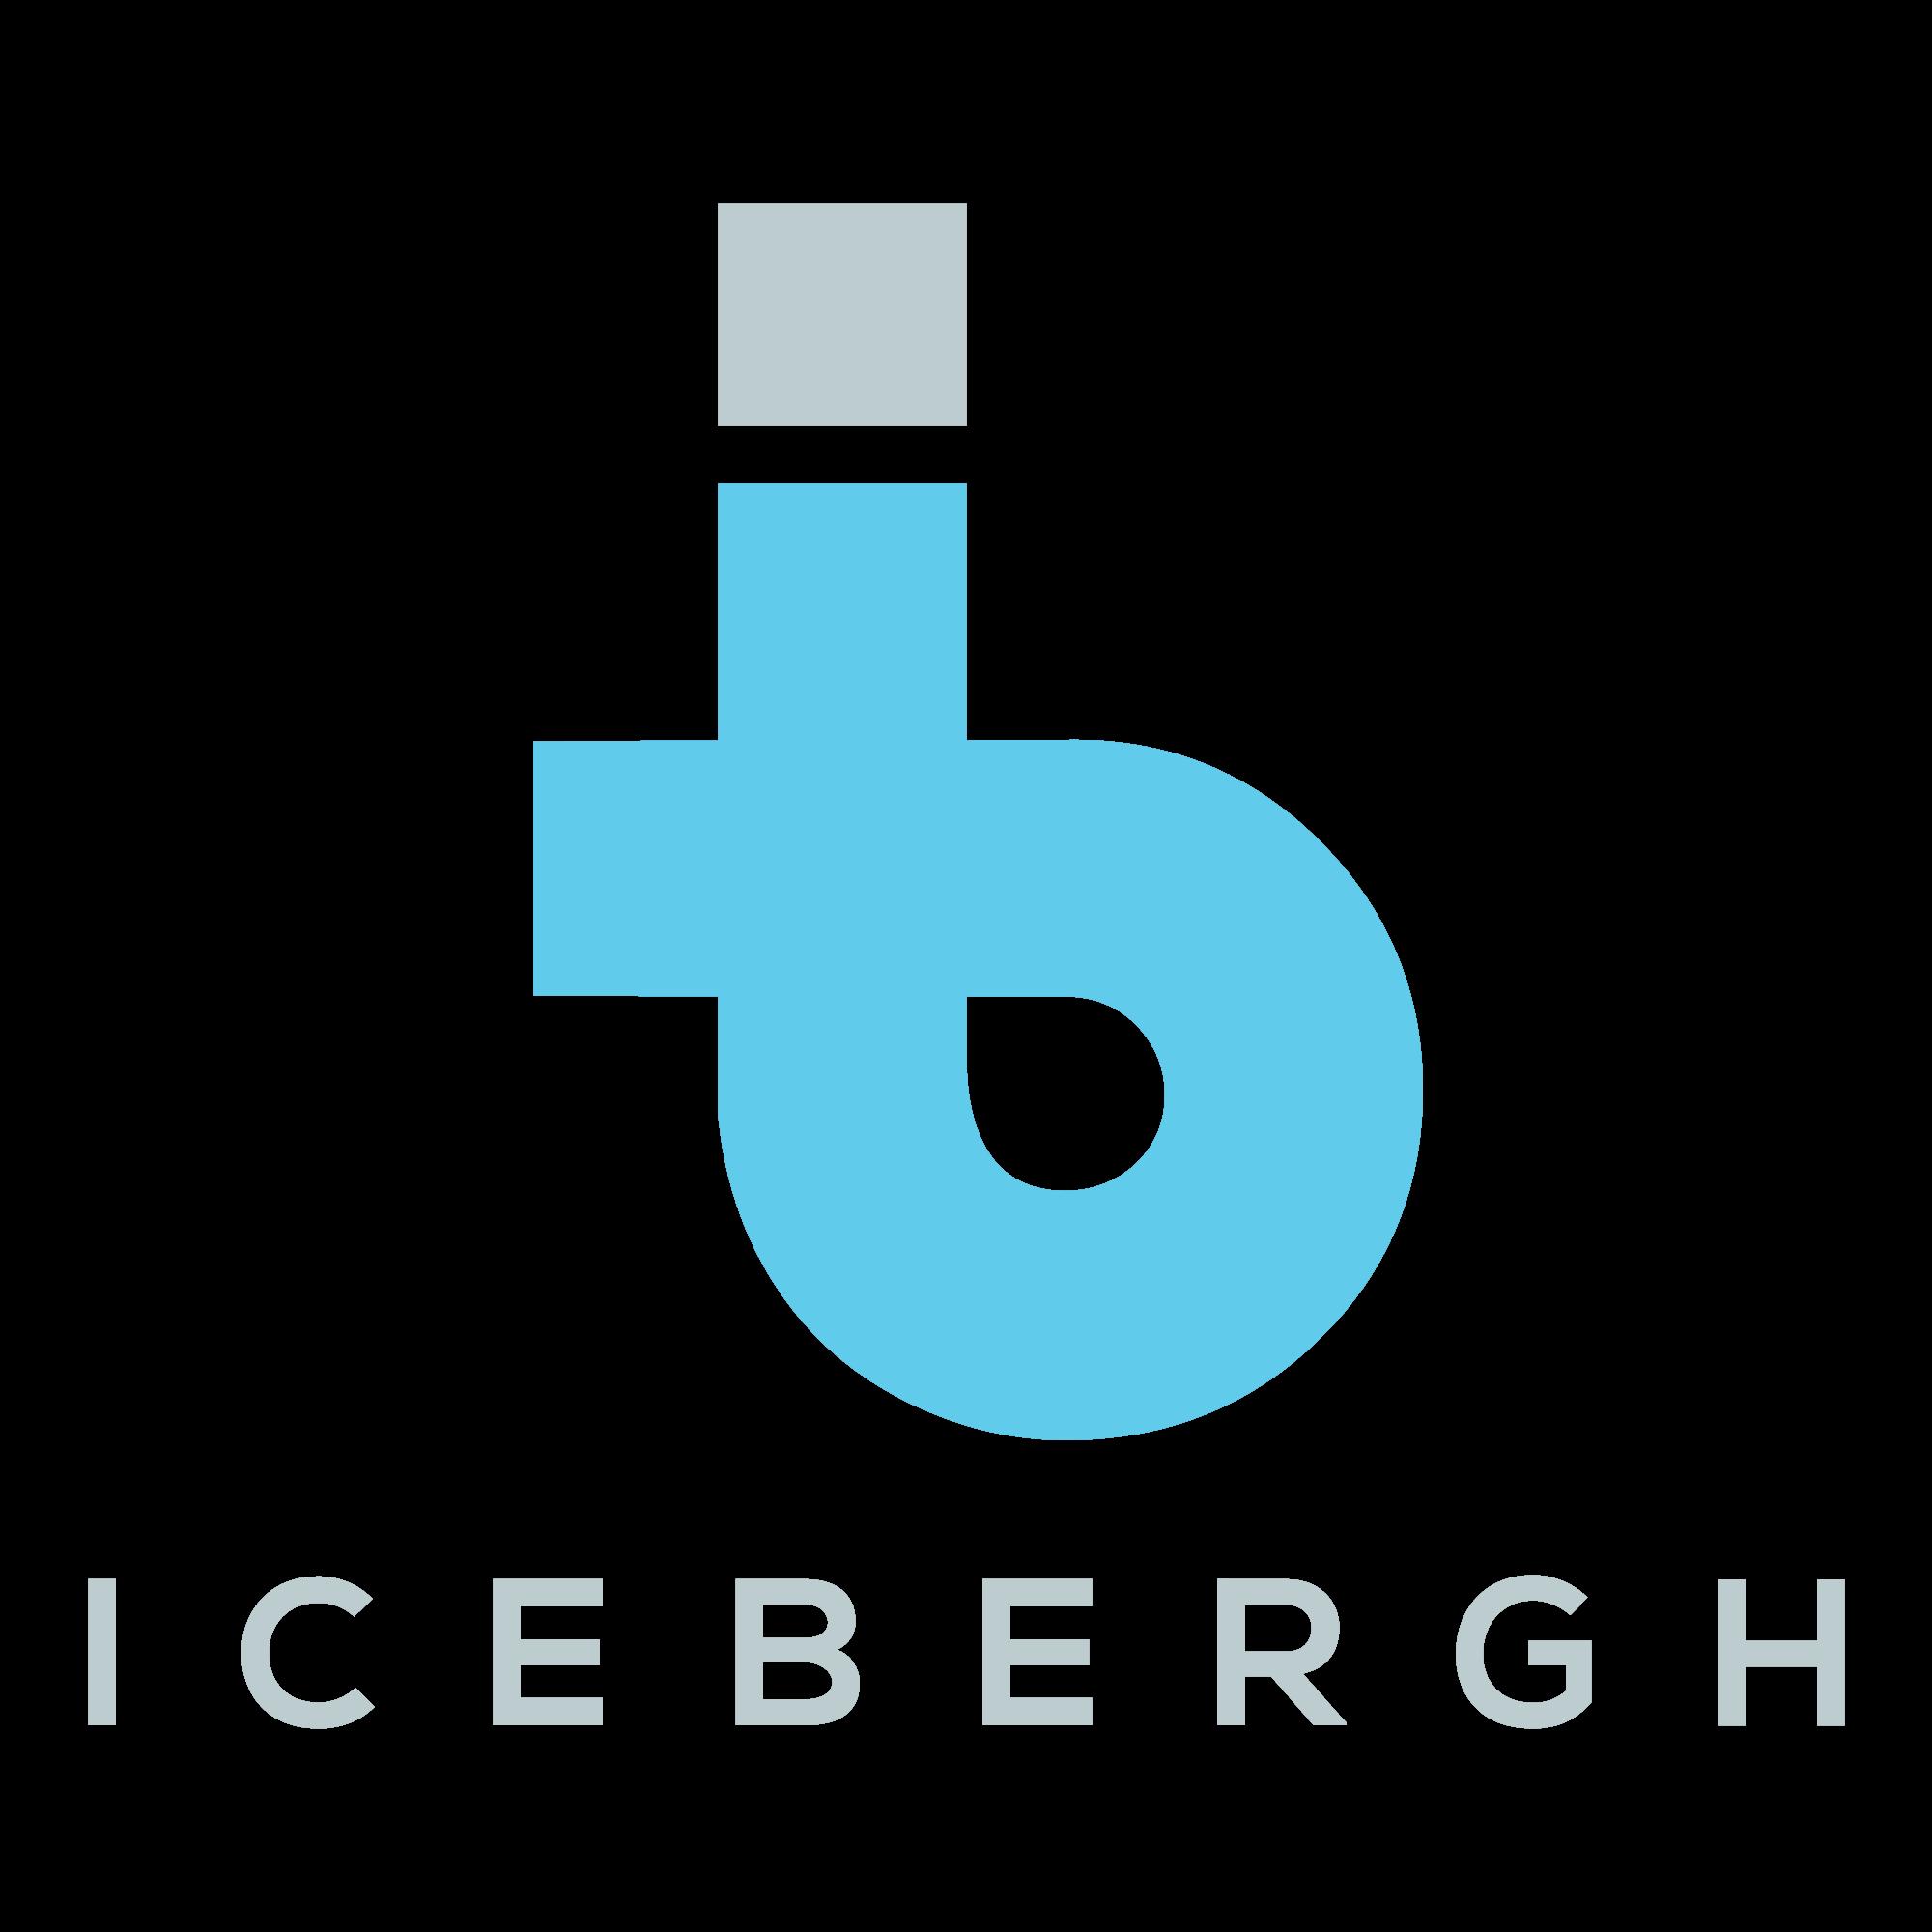 Icebergh_3.png